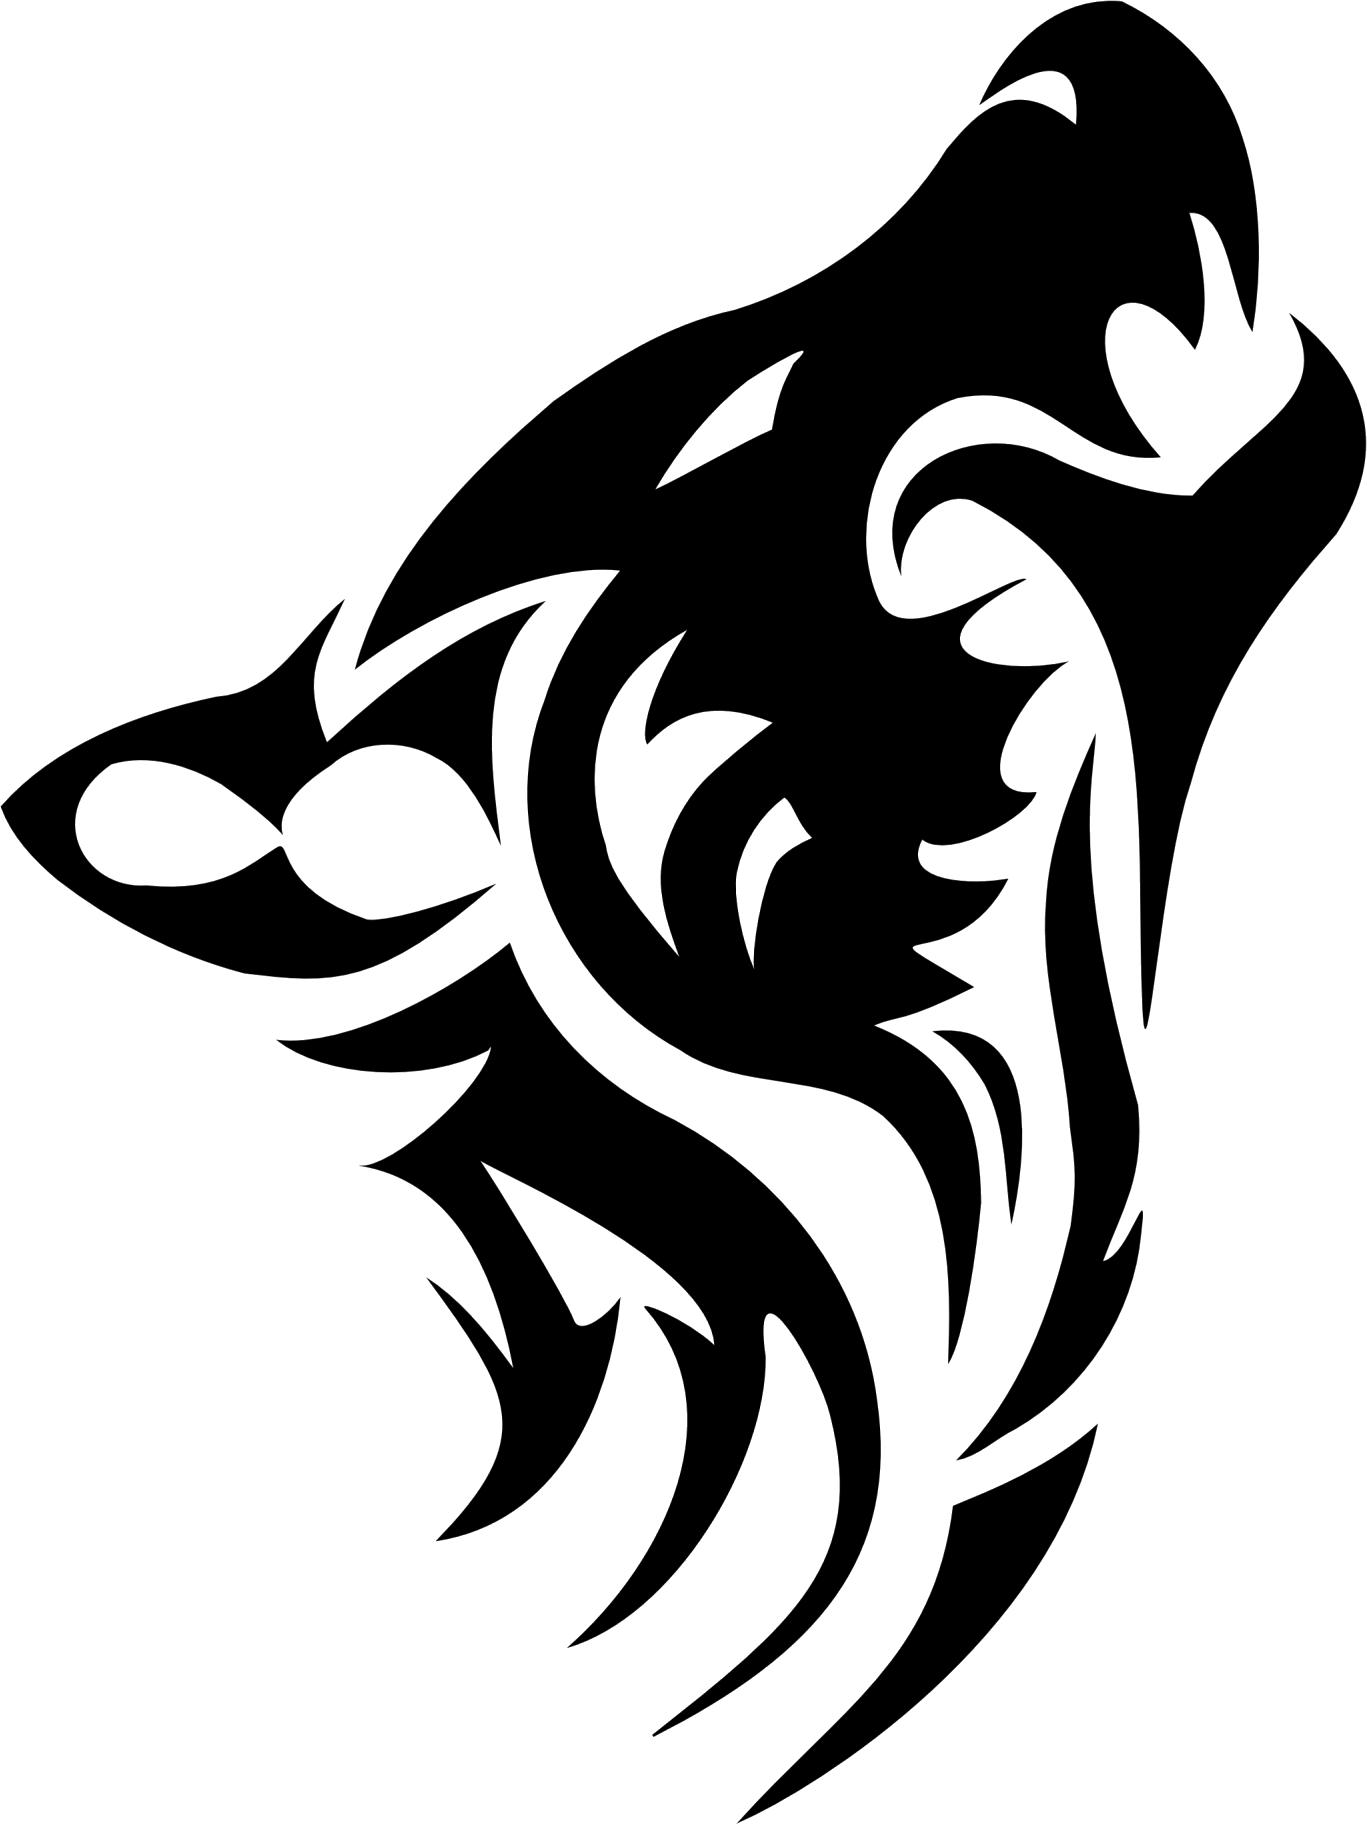 Drawn werewolf transparent Wolves Pinterest PNG Tattoos Tattoos